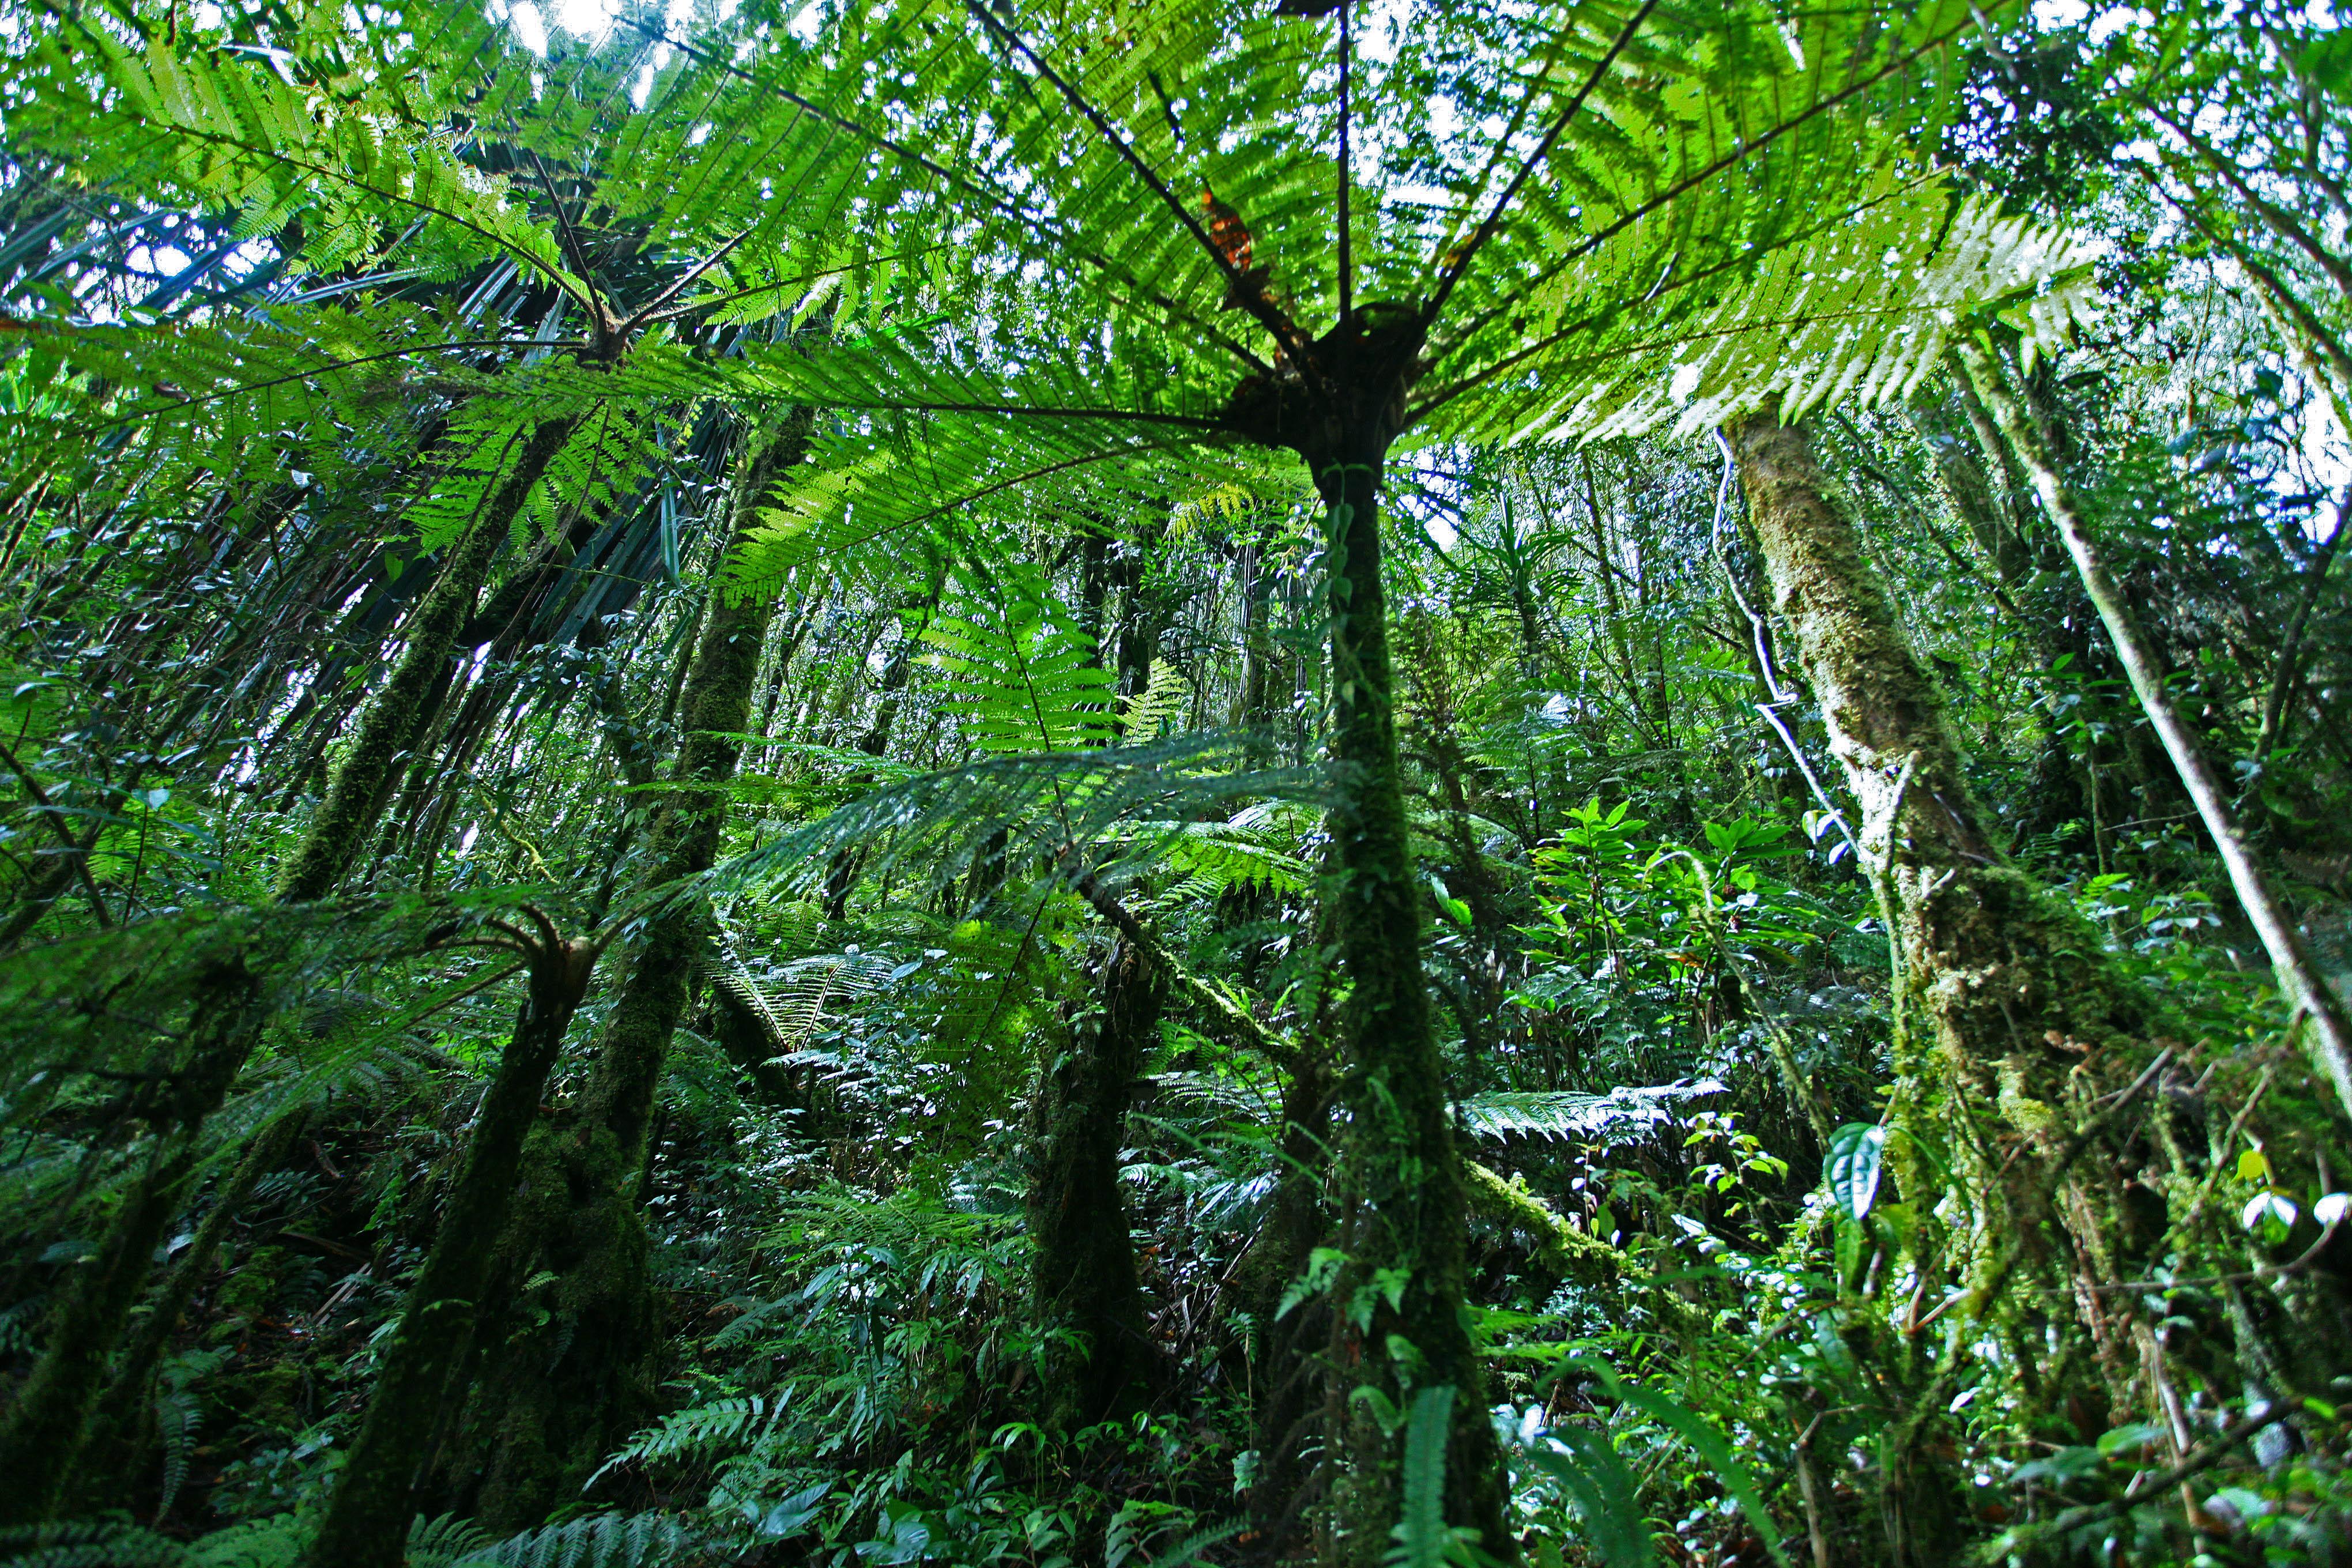 21_Cyathea_Papua_Rain_Forest_Papua-Indonesia